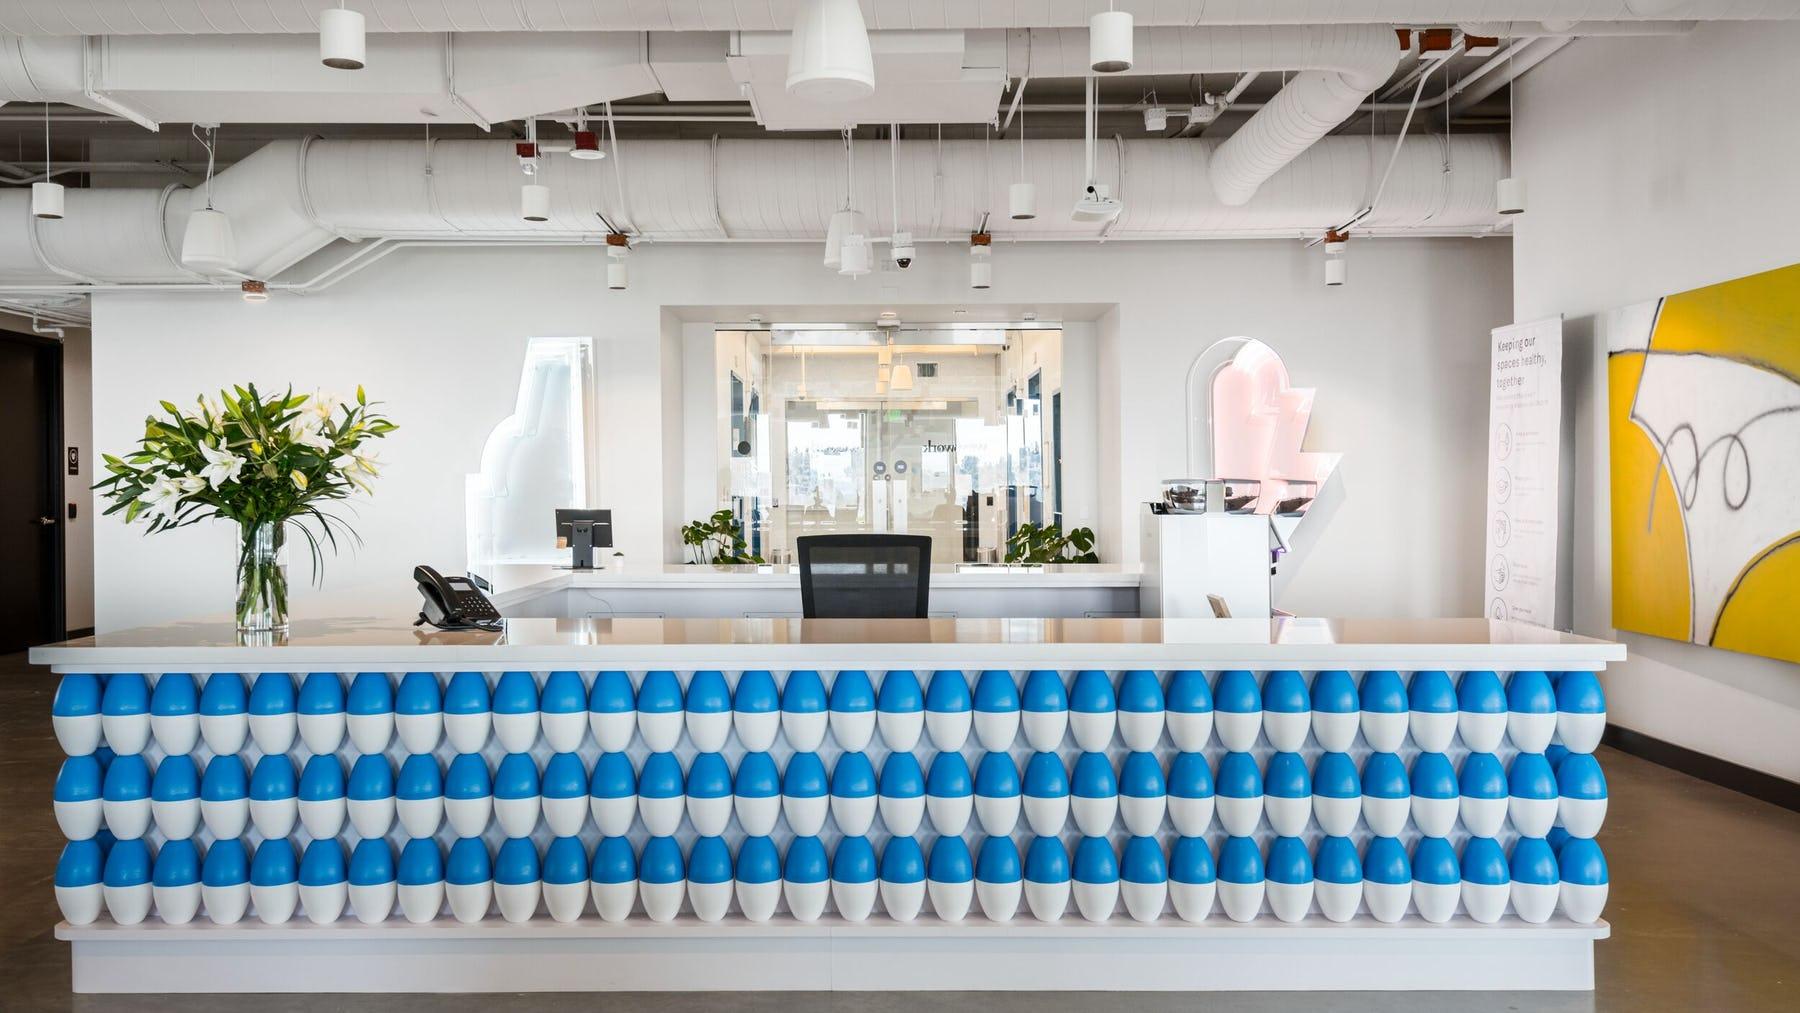 WeWork shutting down Ballard location in Seattle as it restructures real estate footprint